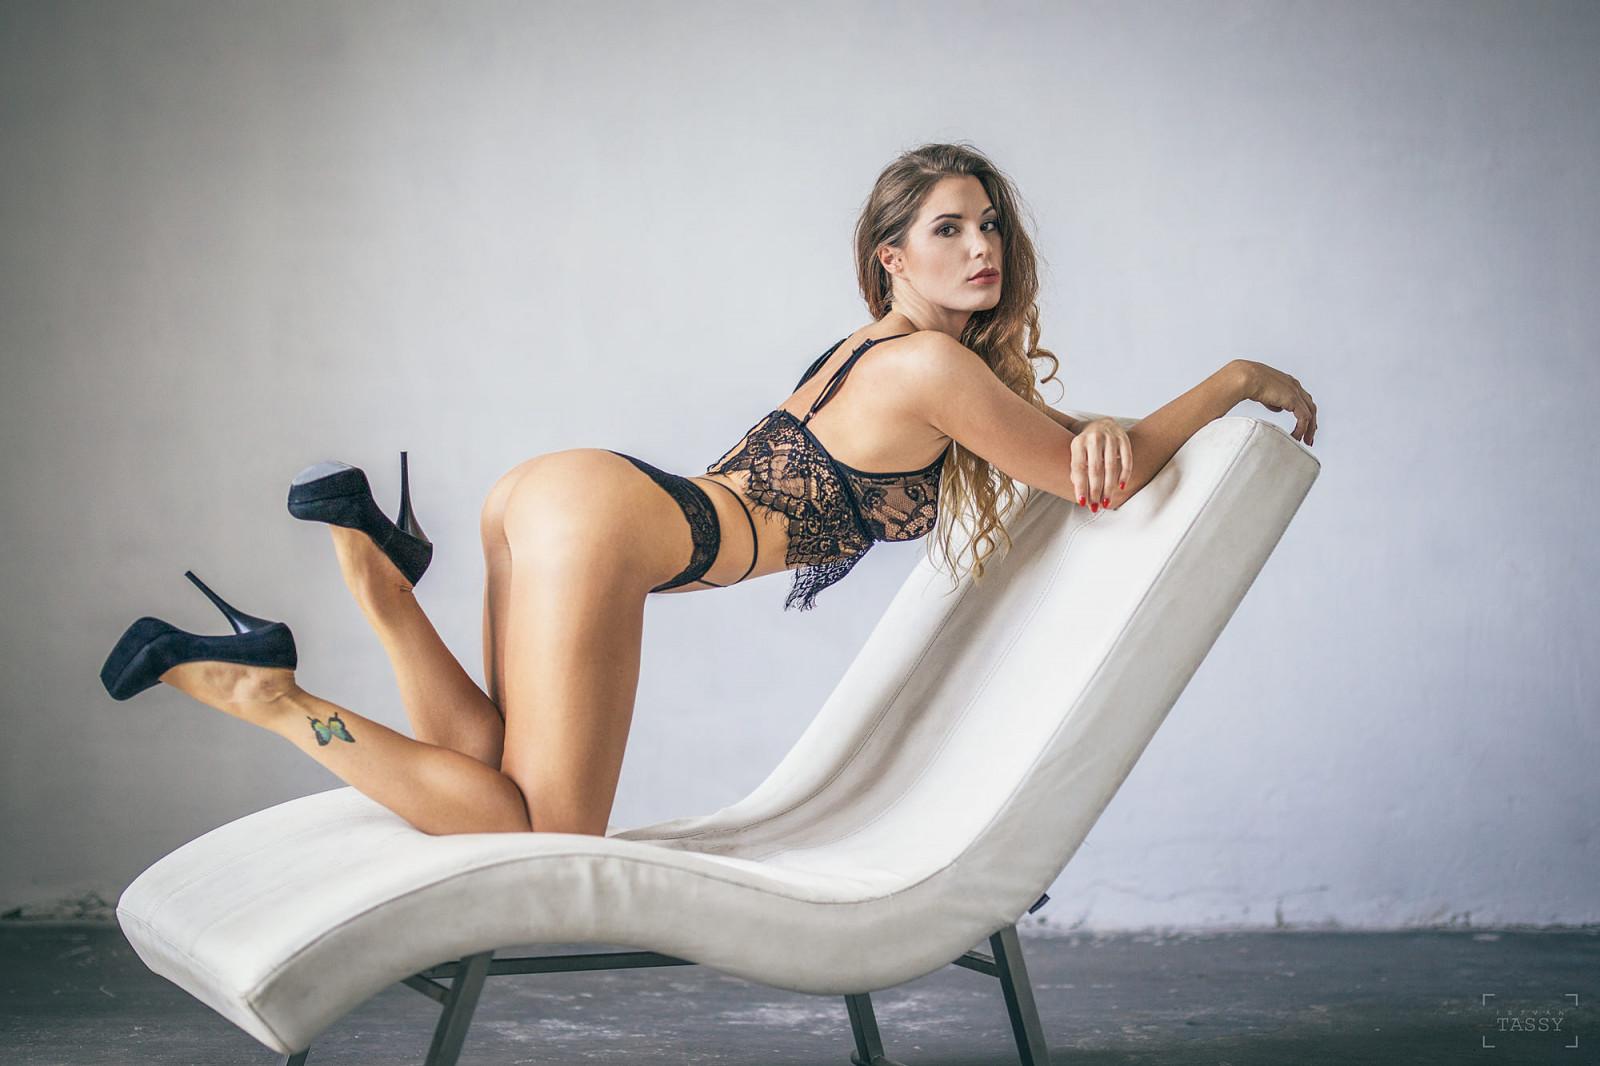 Advise you nude brunette high heels bent over does